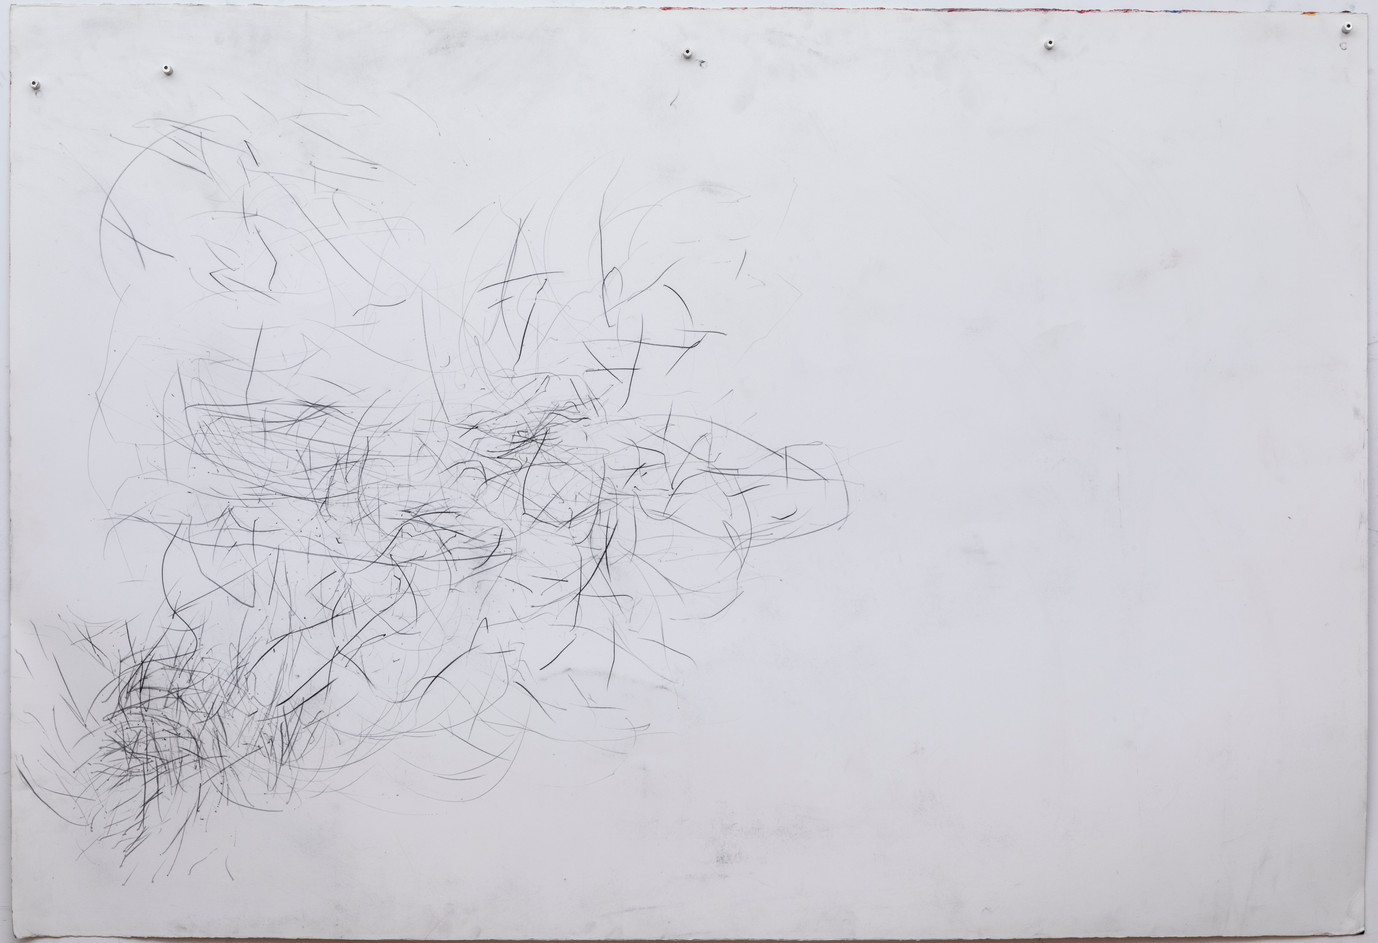 104 x 152 cm lápis conté sobre papel foto: Ruy Teixeira